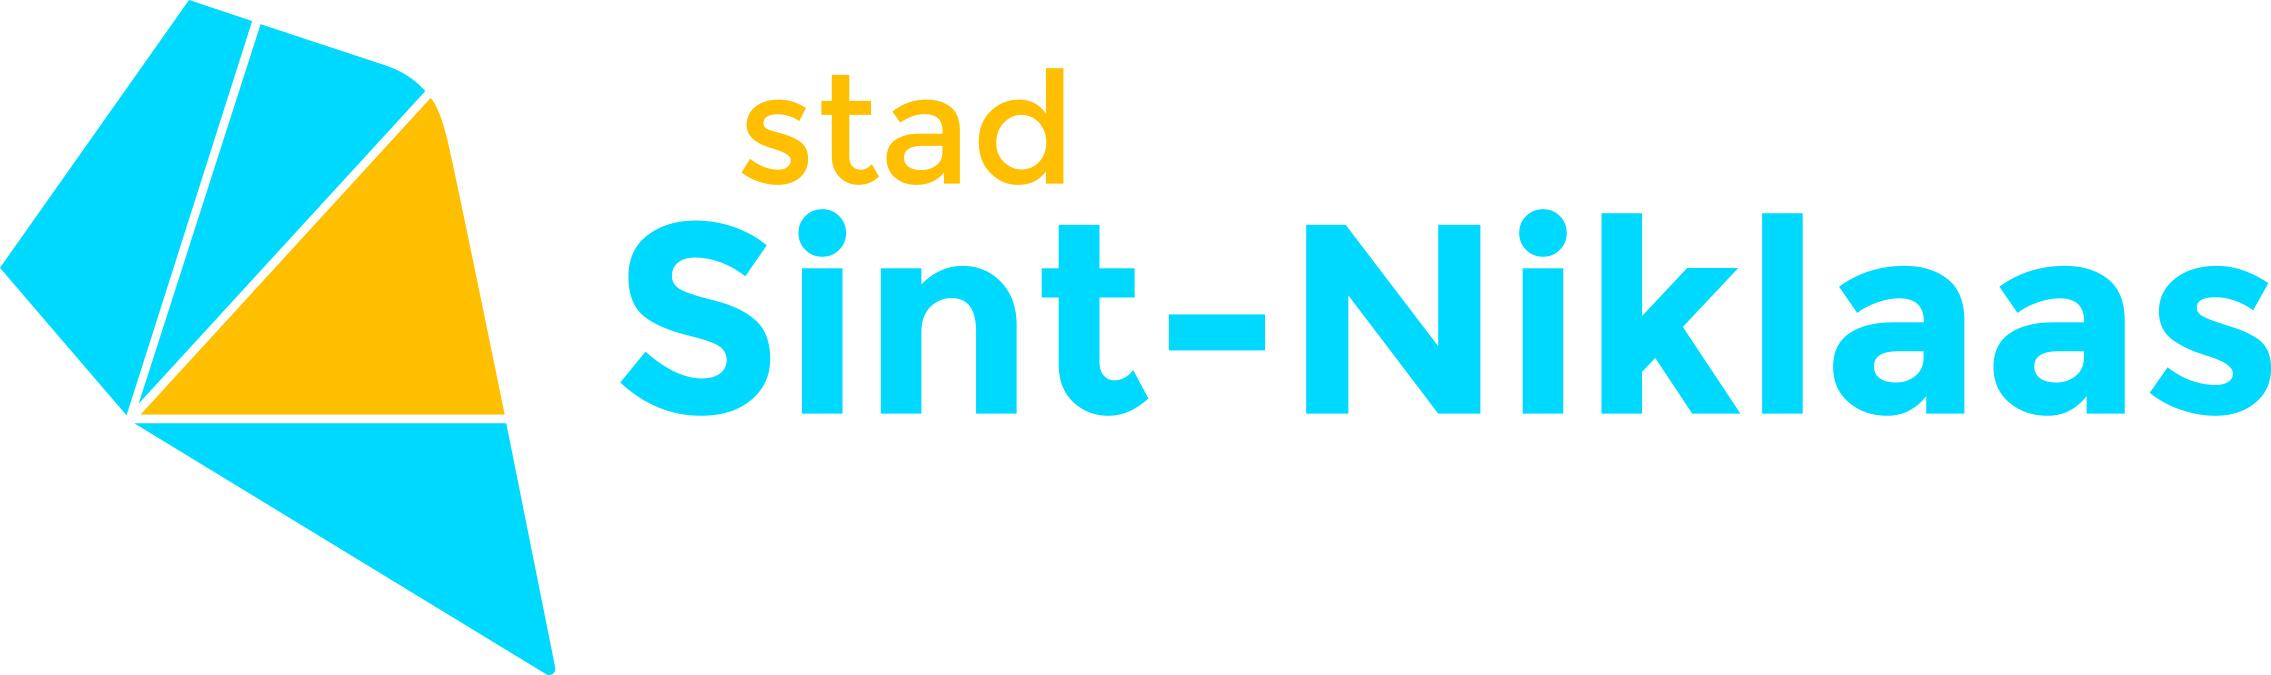 logo van Stad Sint-Niklaas